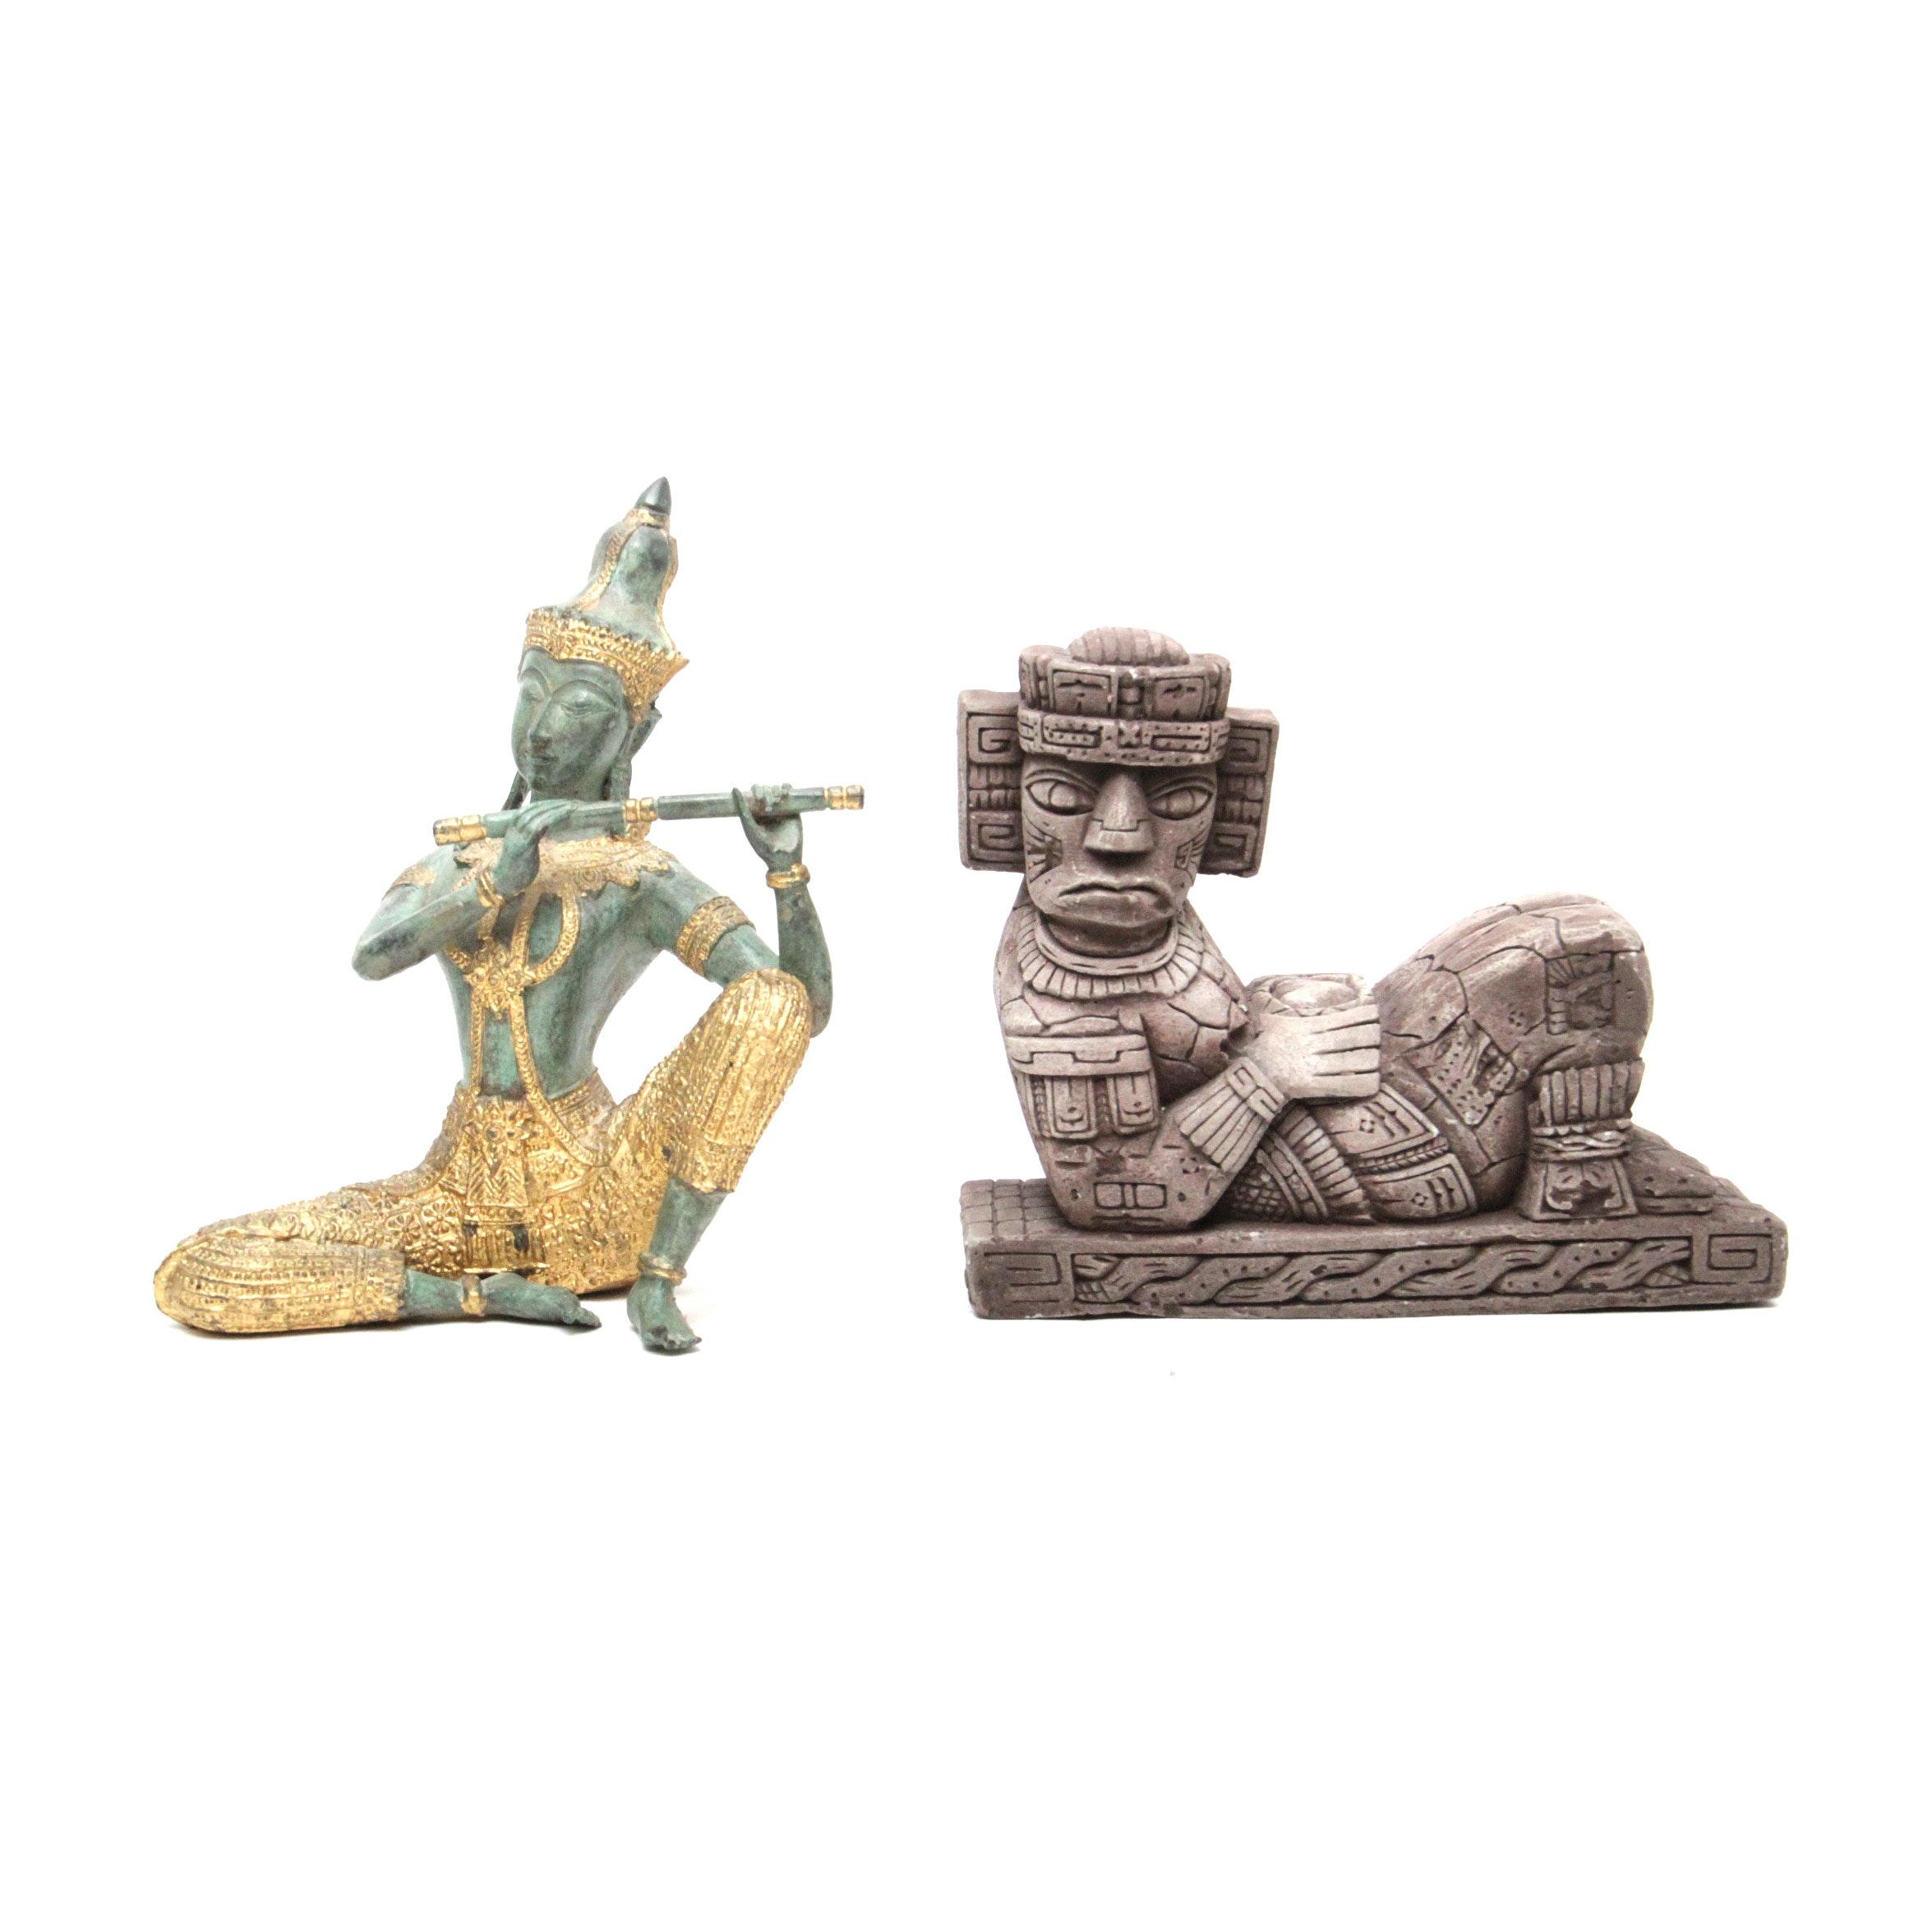 Thai and Mesoamerican Figurines